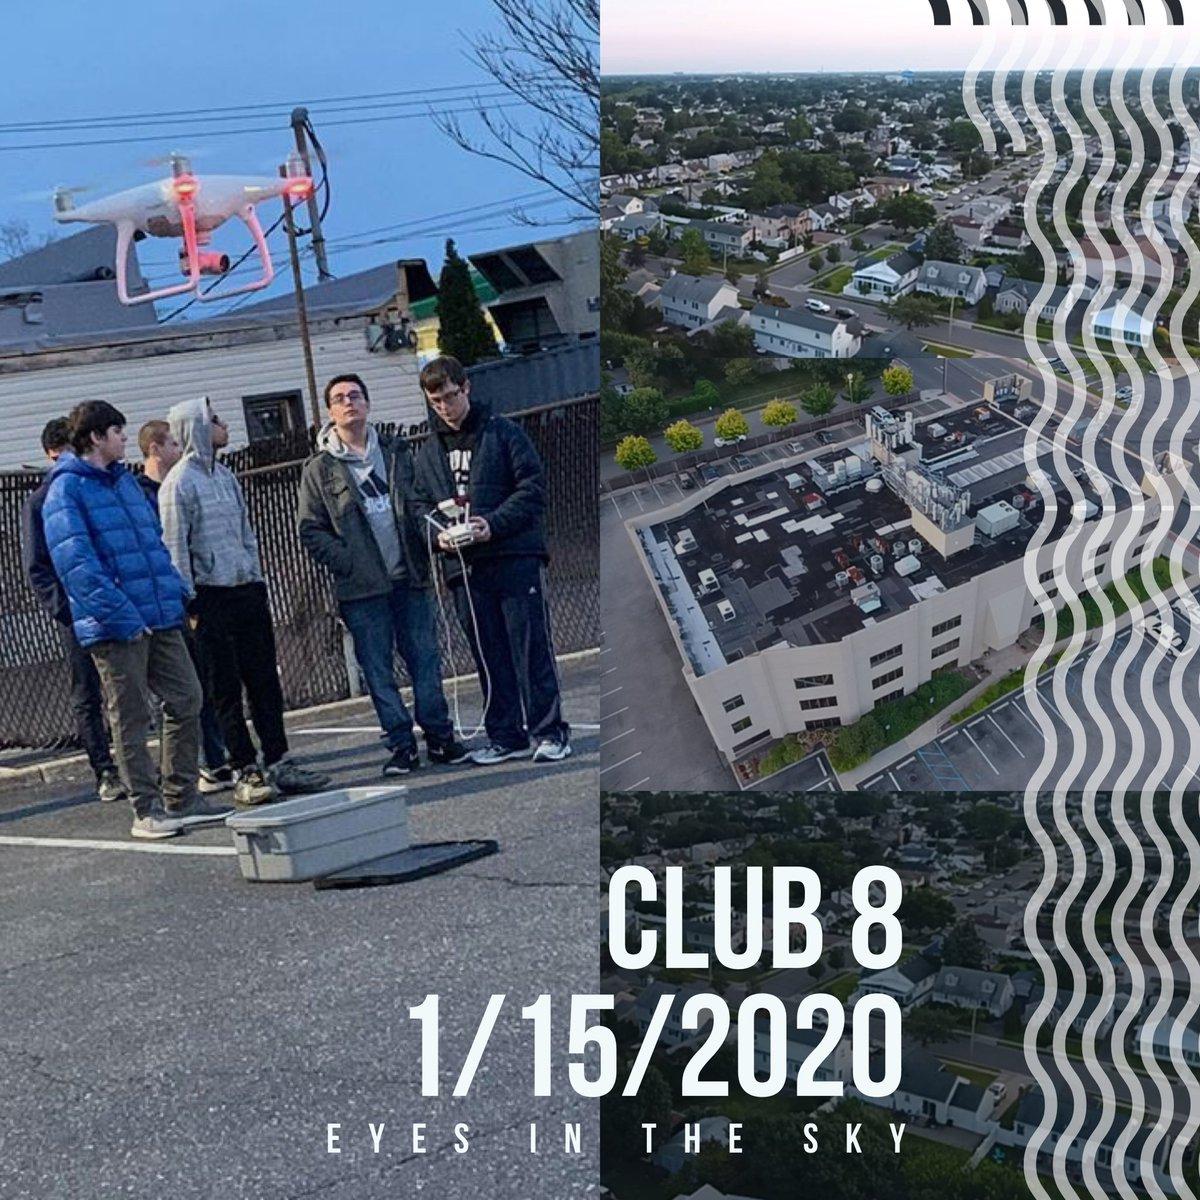 CLUB88888888 photo